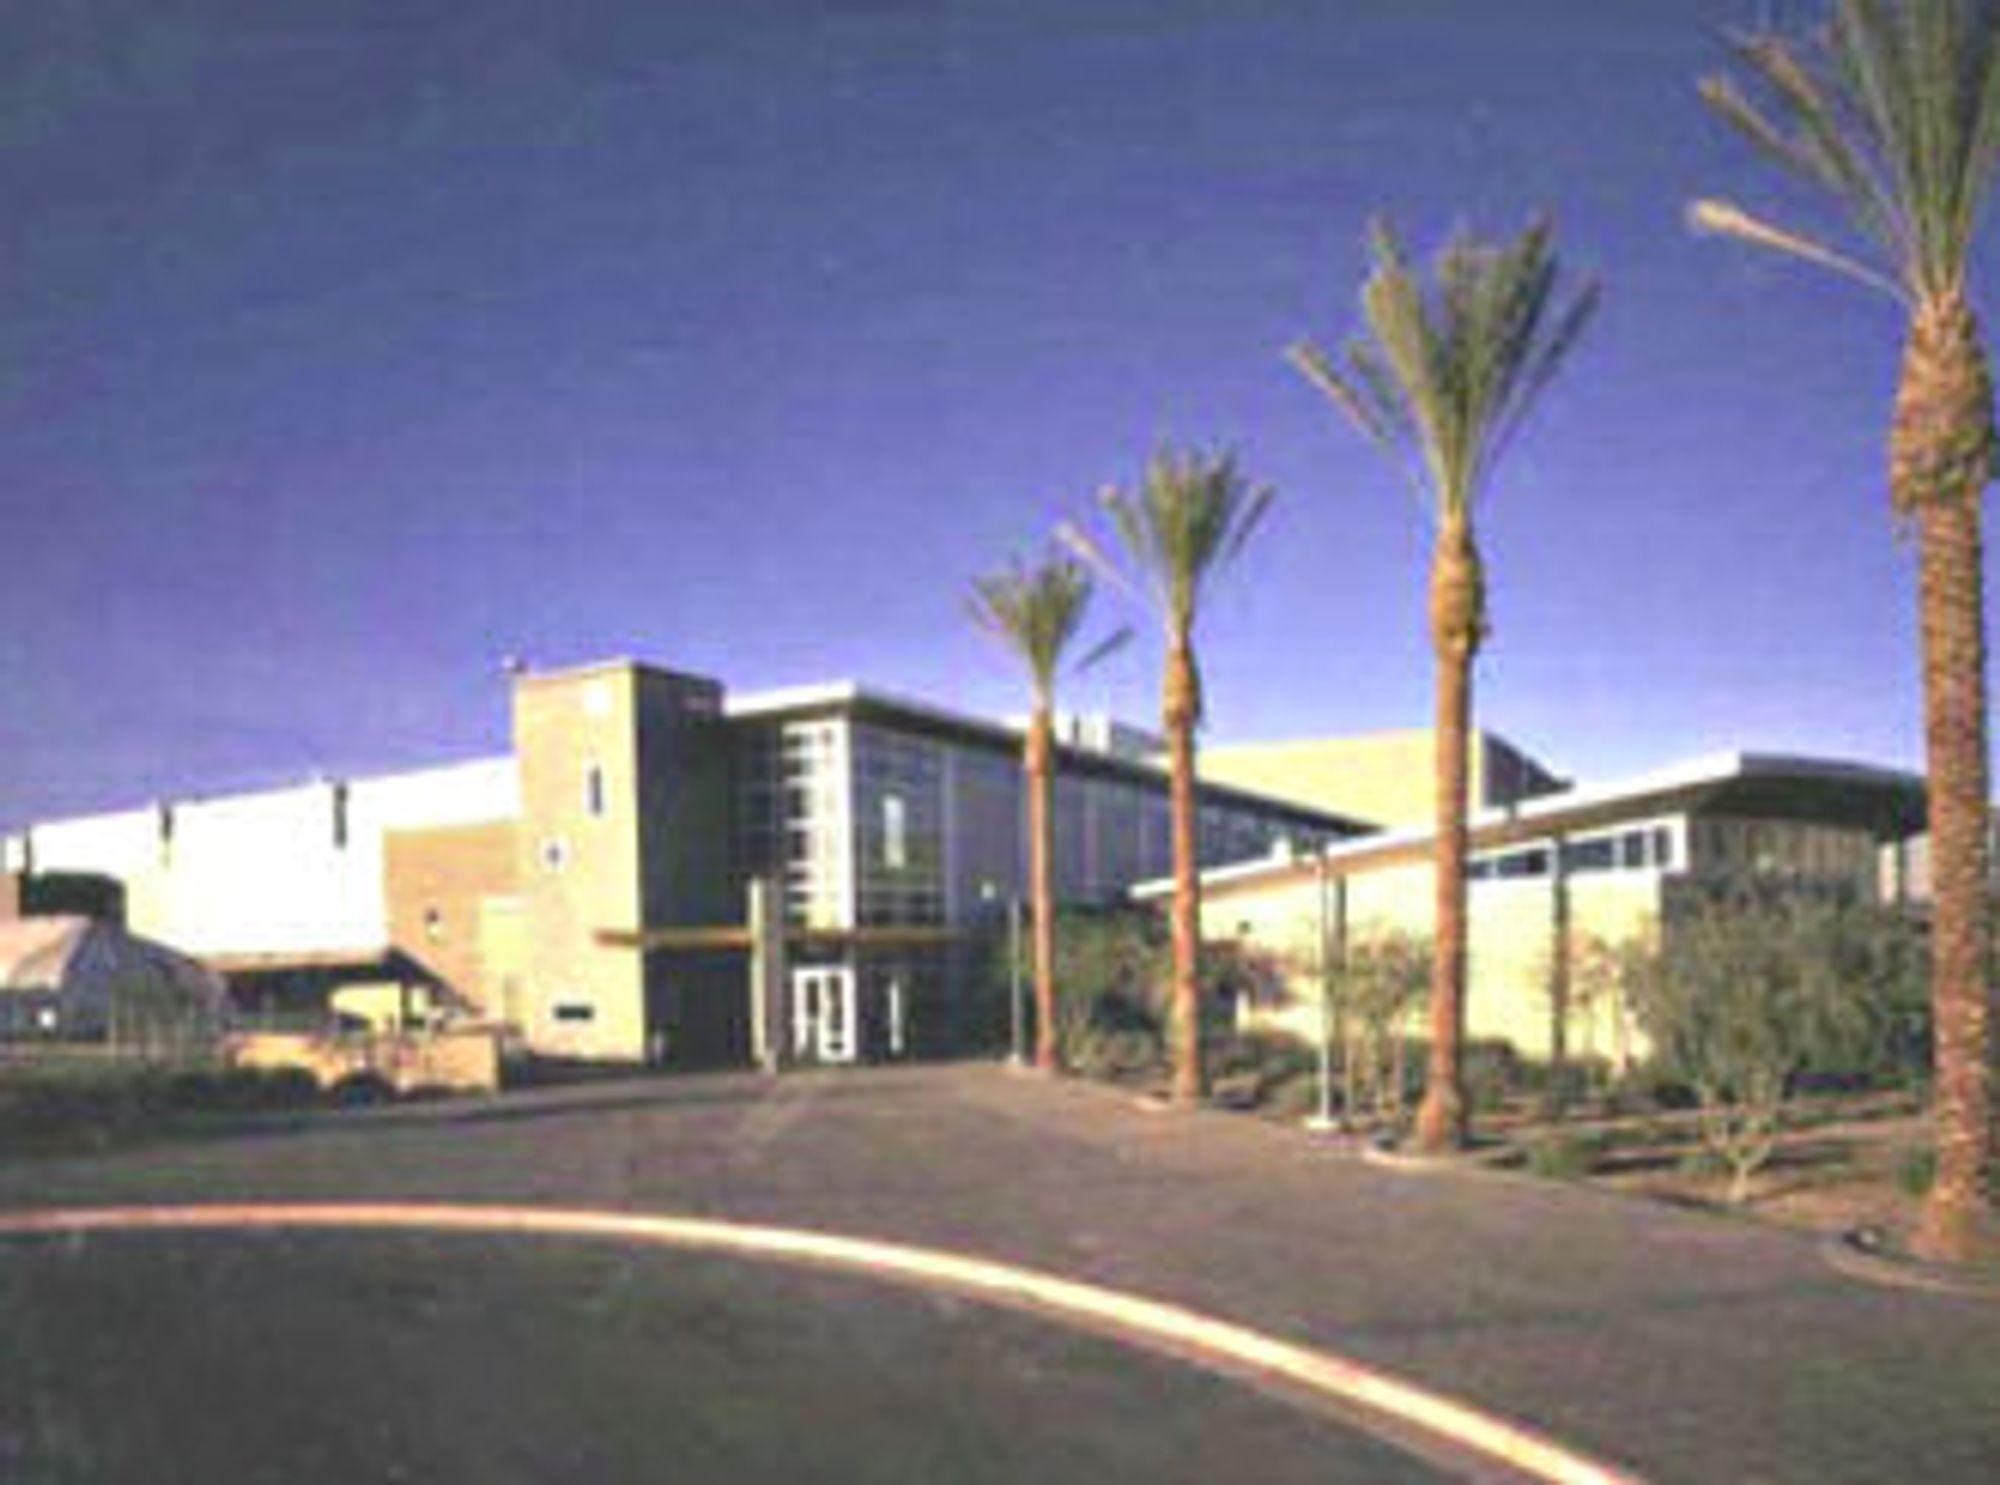 Bildet viser Intels Fab 12 i Arizona